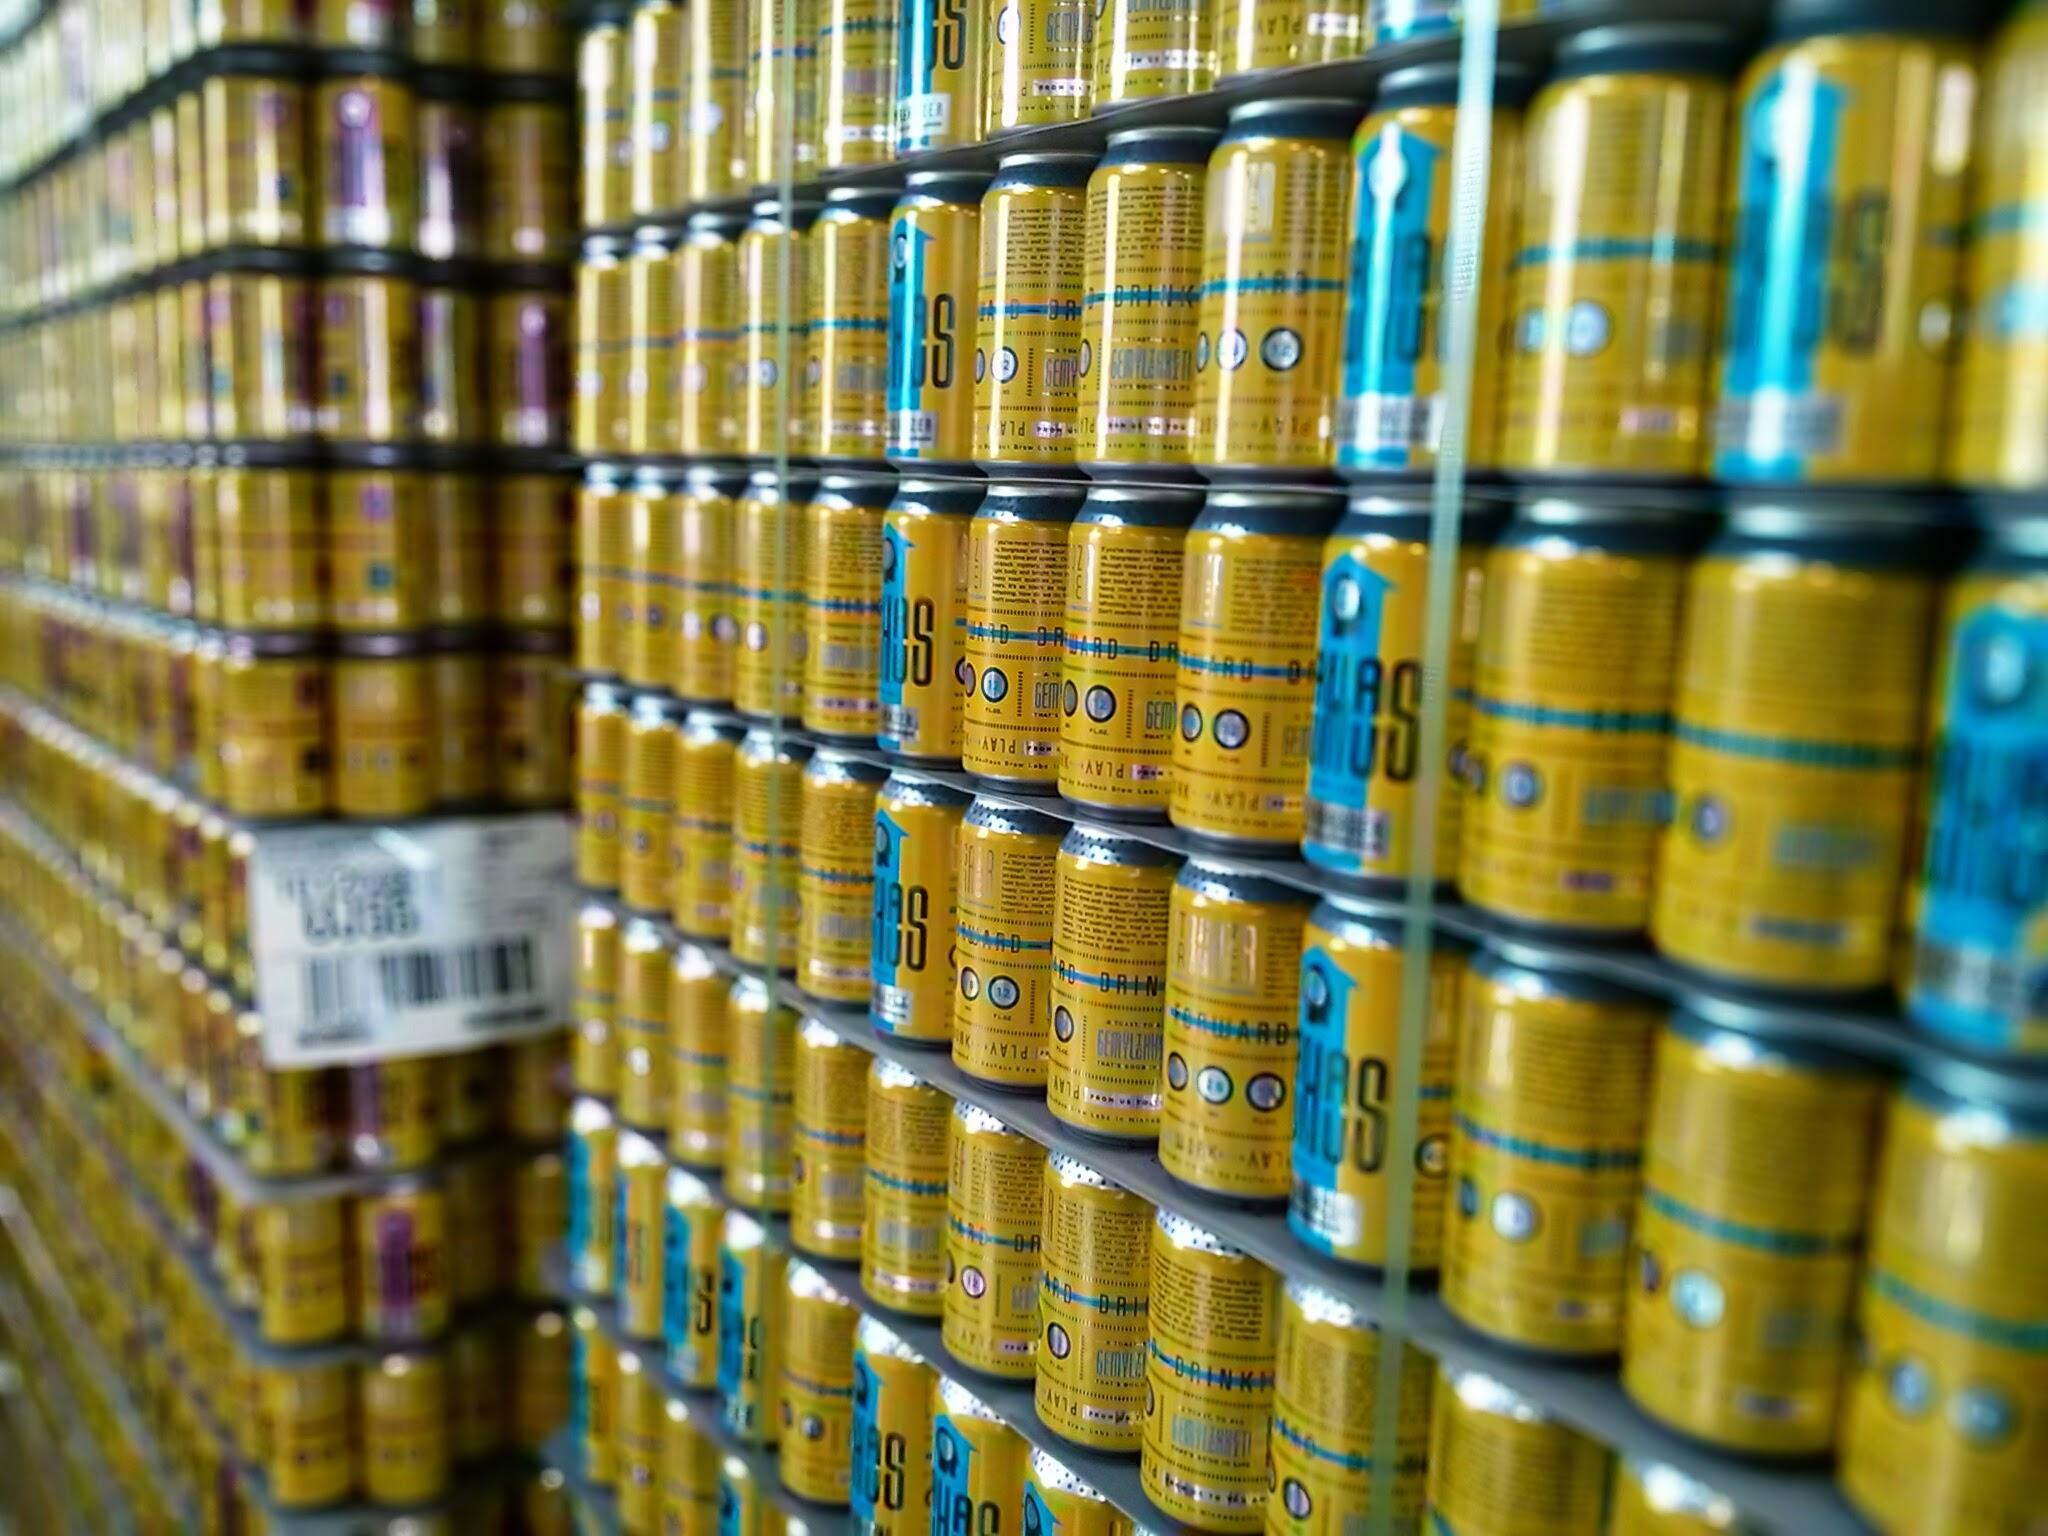 Bauhaus Brew Labs Cans